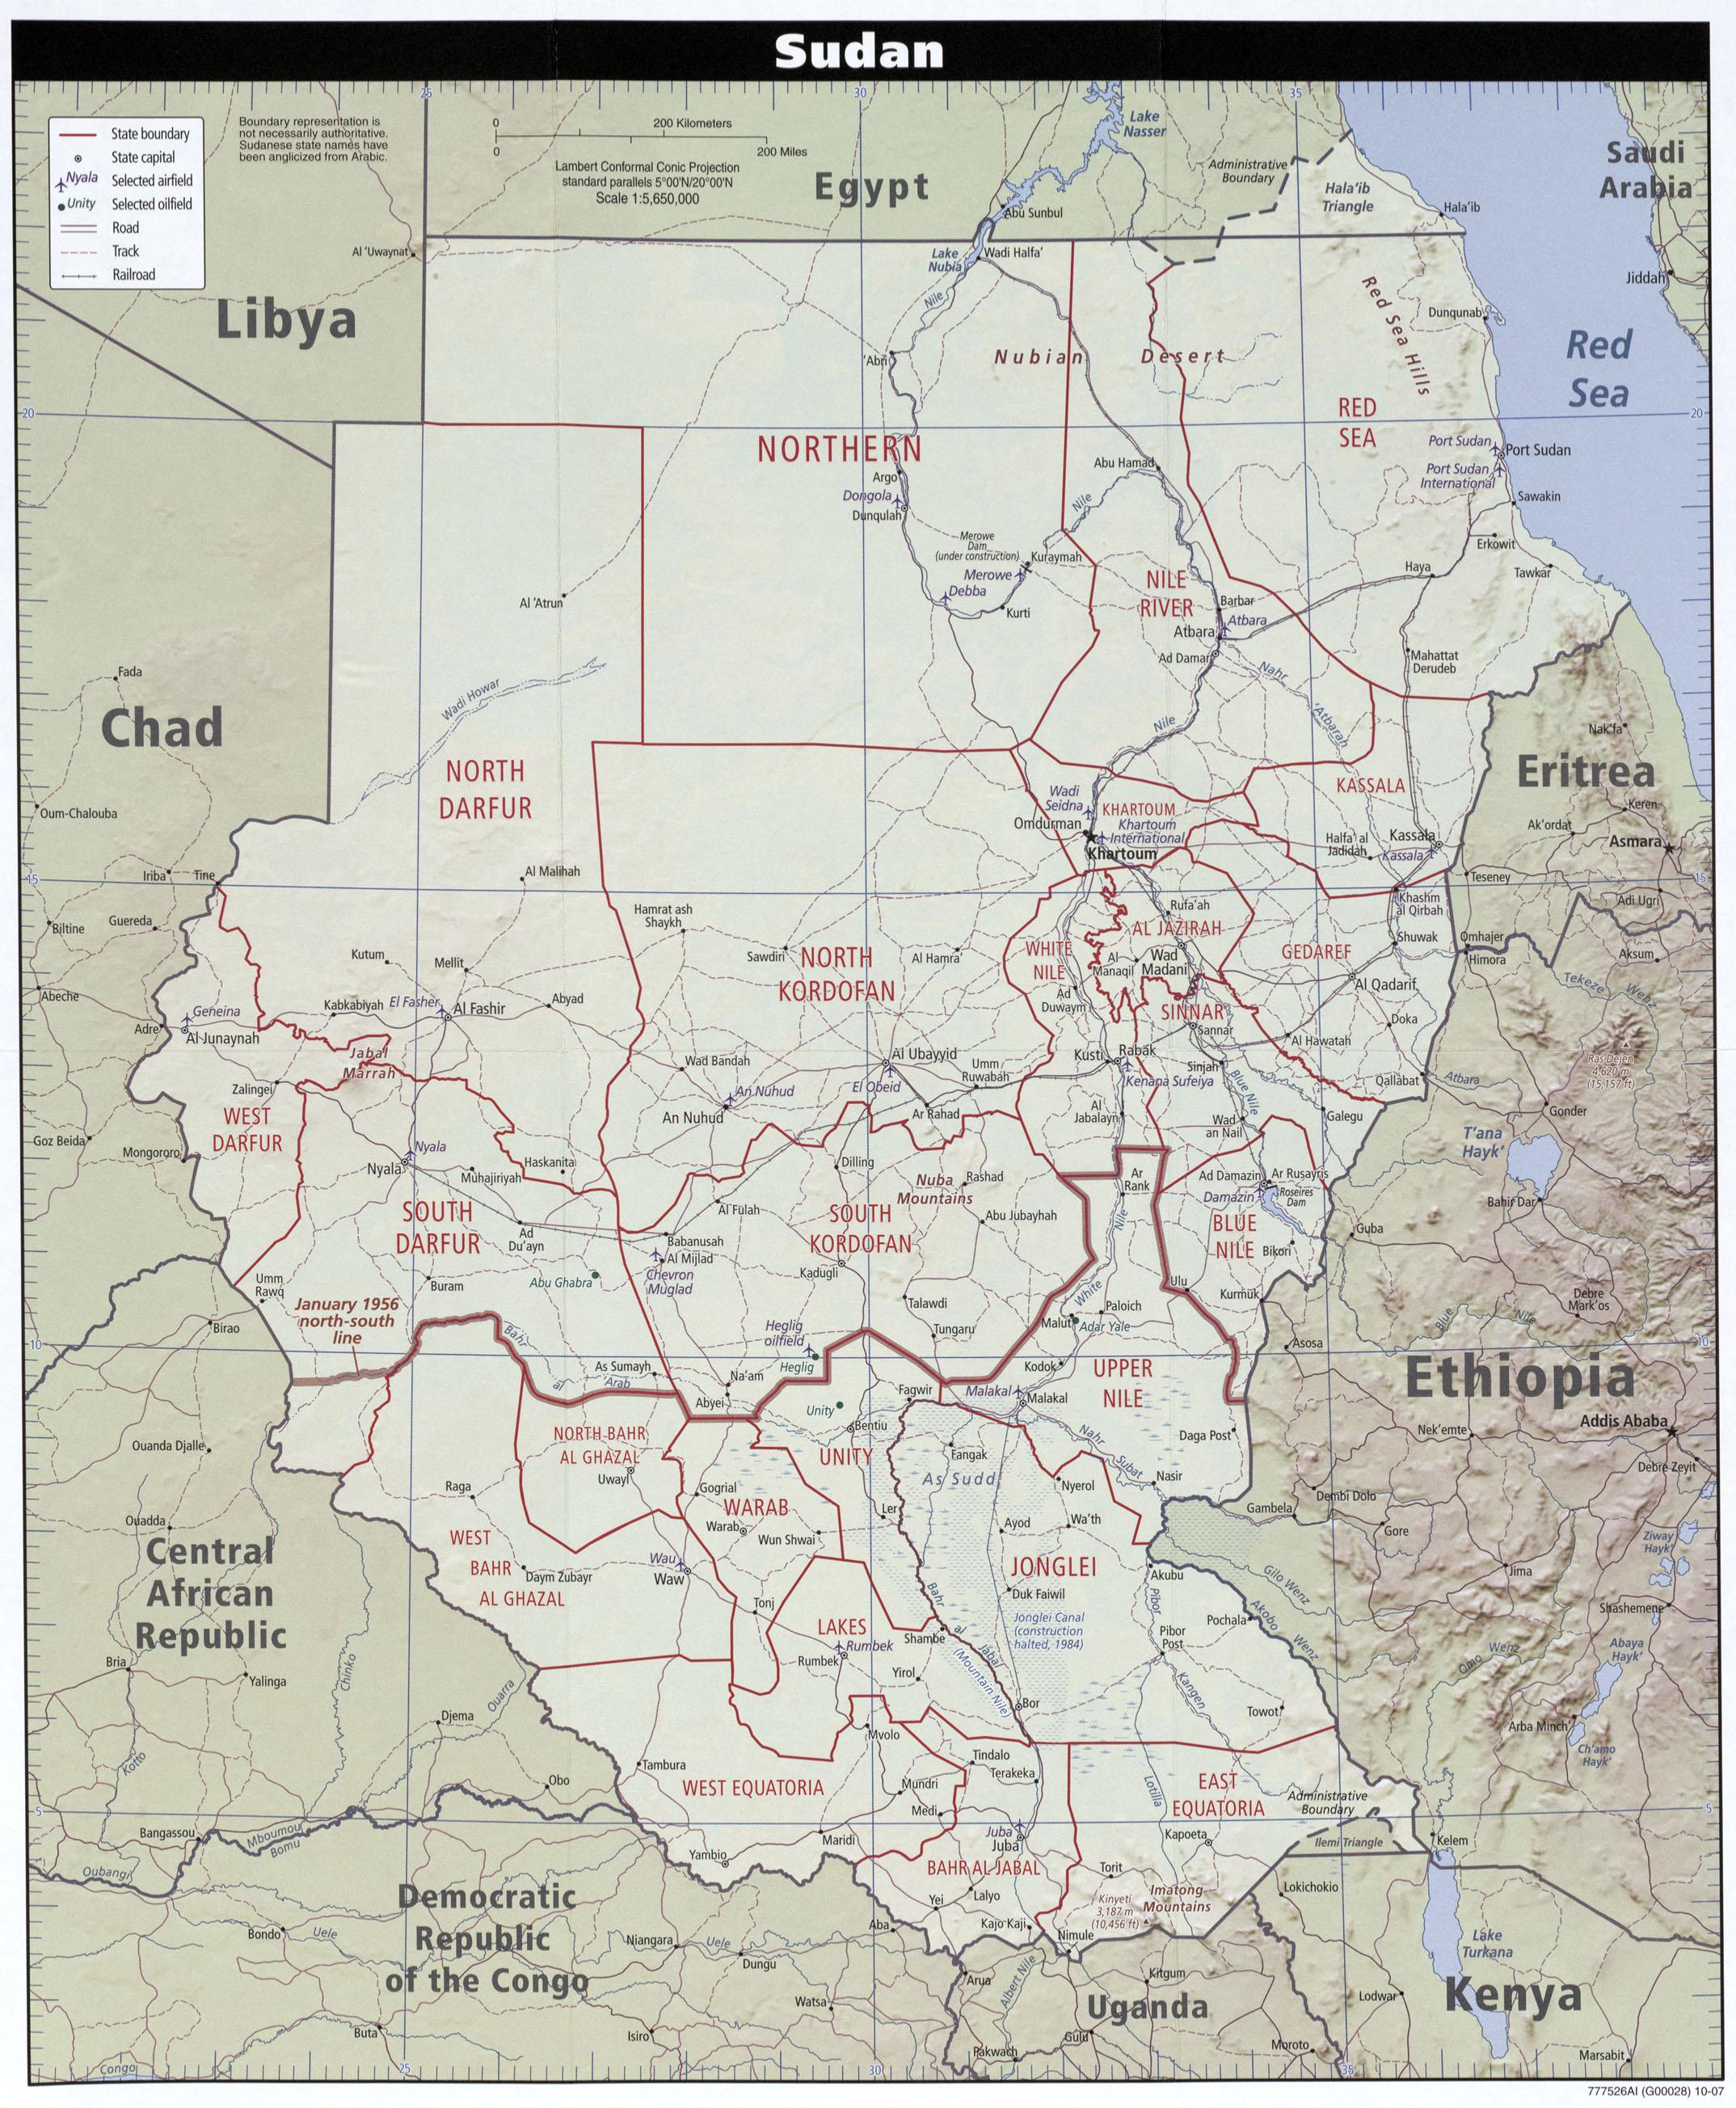 Download Free Sudan Darfur Maps on